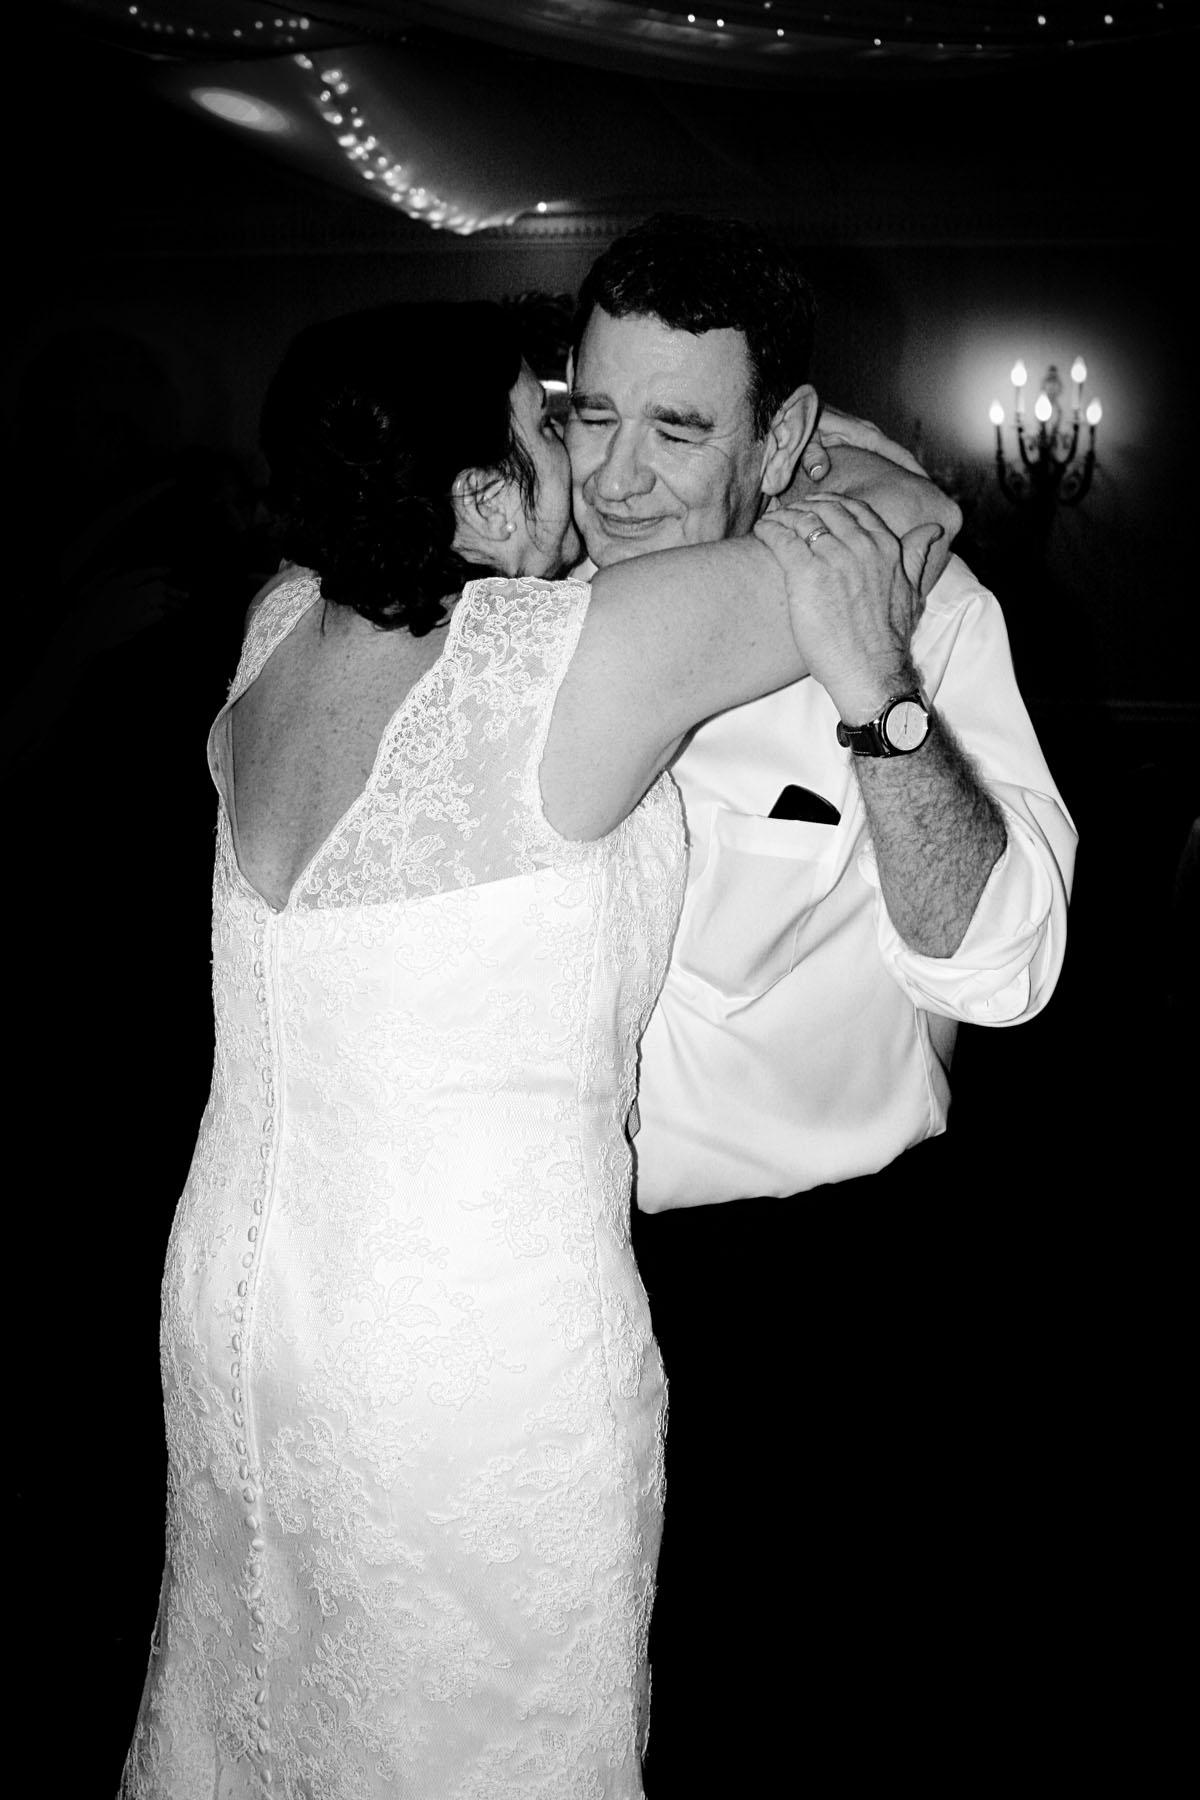 sue_scott_hugging_bw_1.jpg